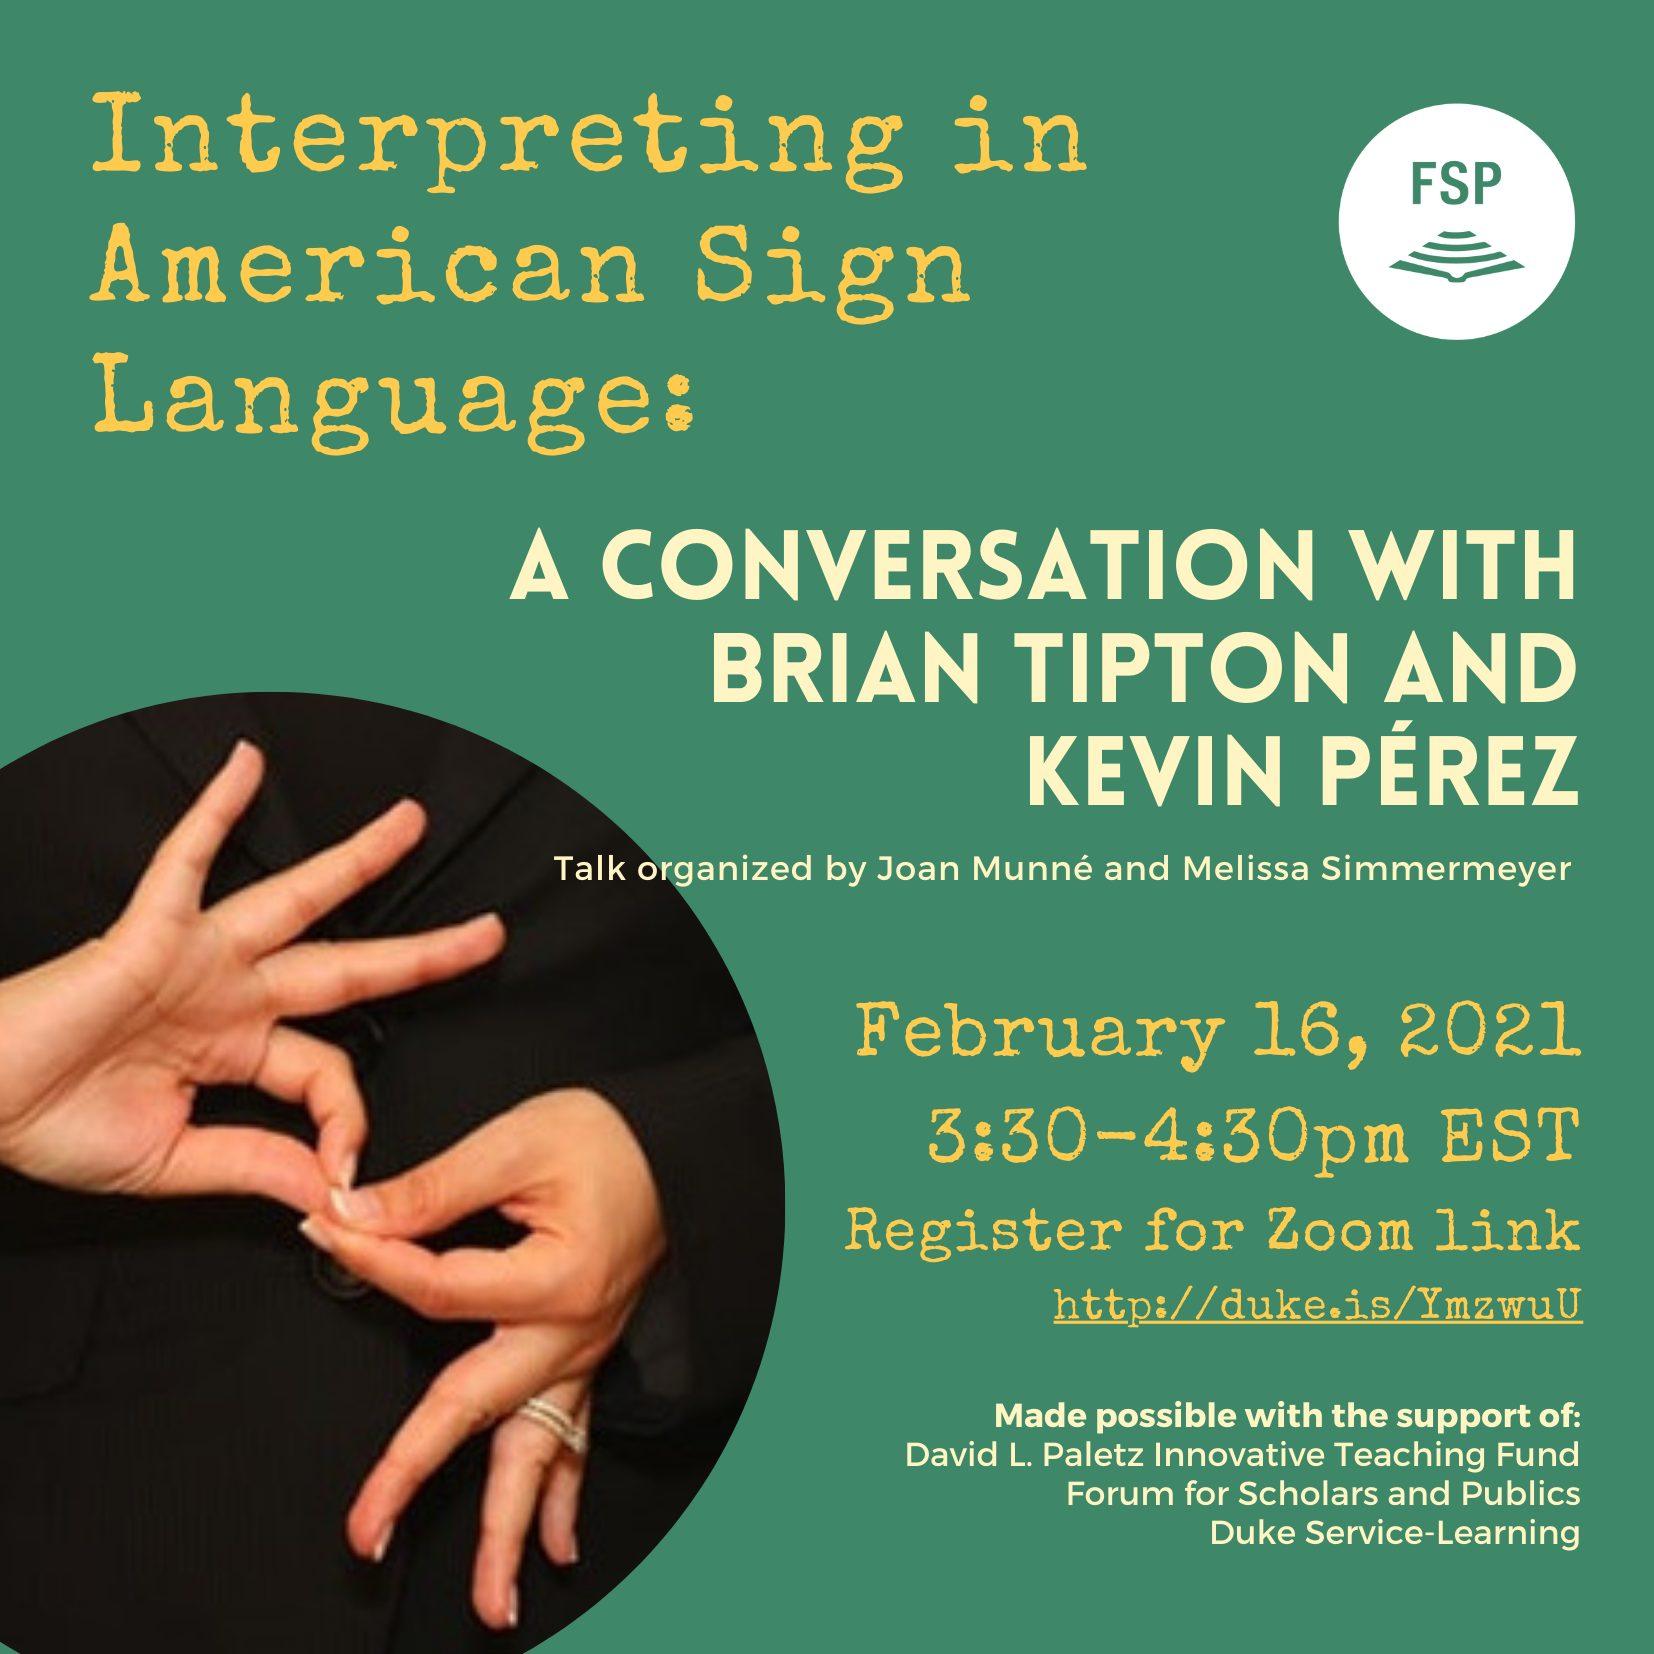 Interpreting in American Sign Language